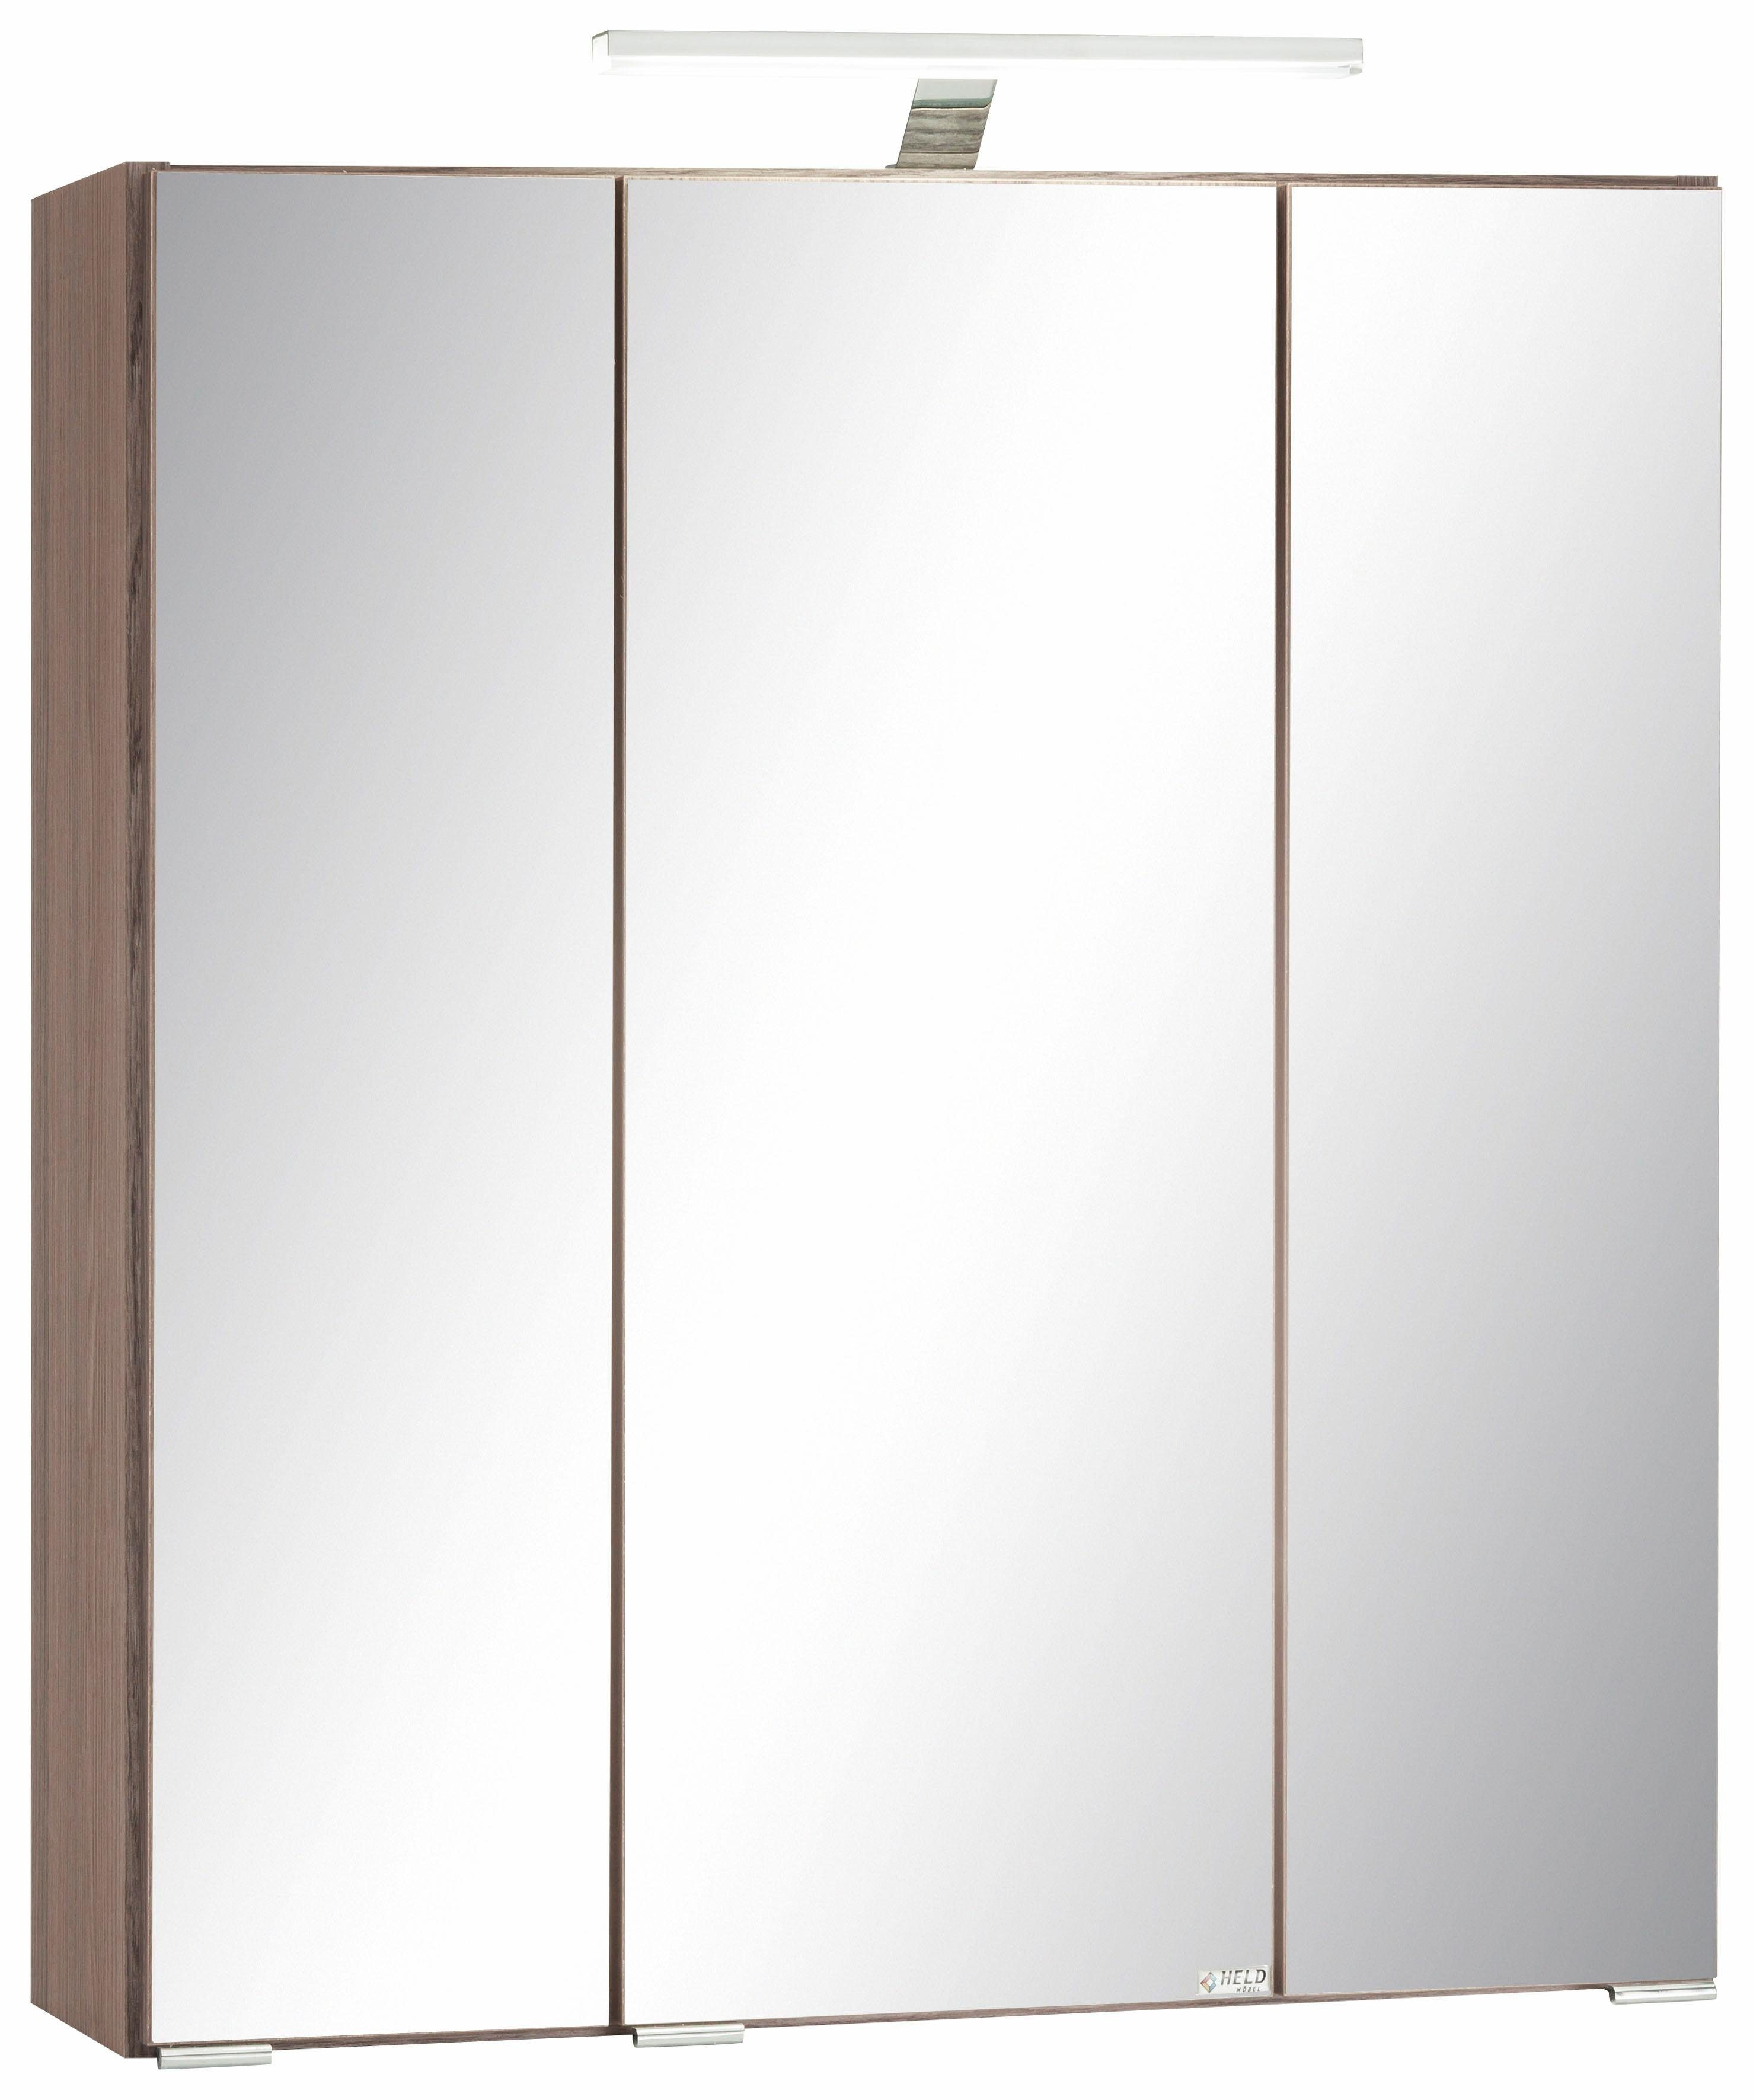 Held Möbel Spiegelschrank »Nizza«